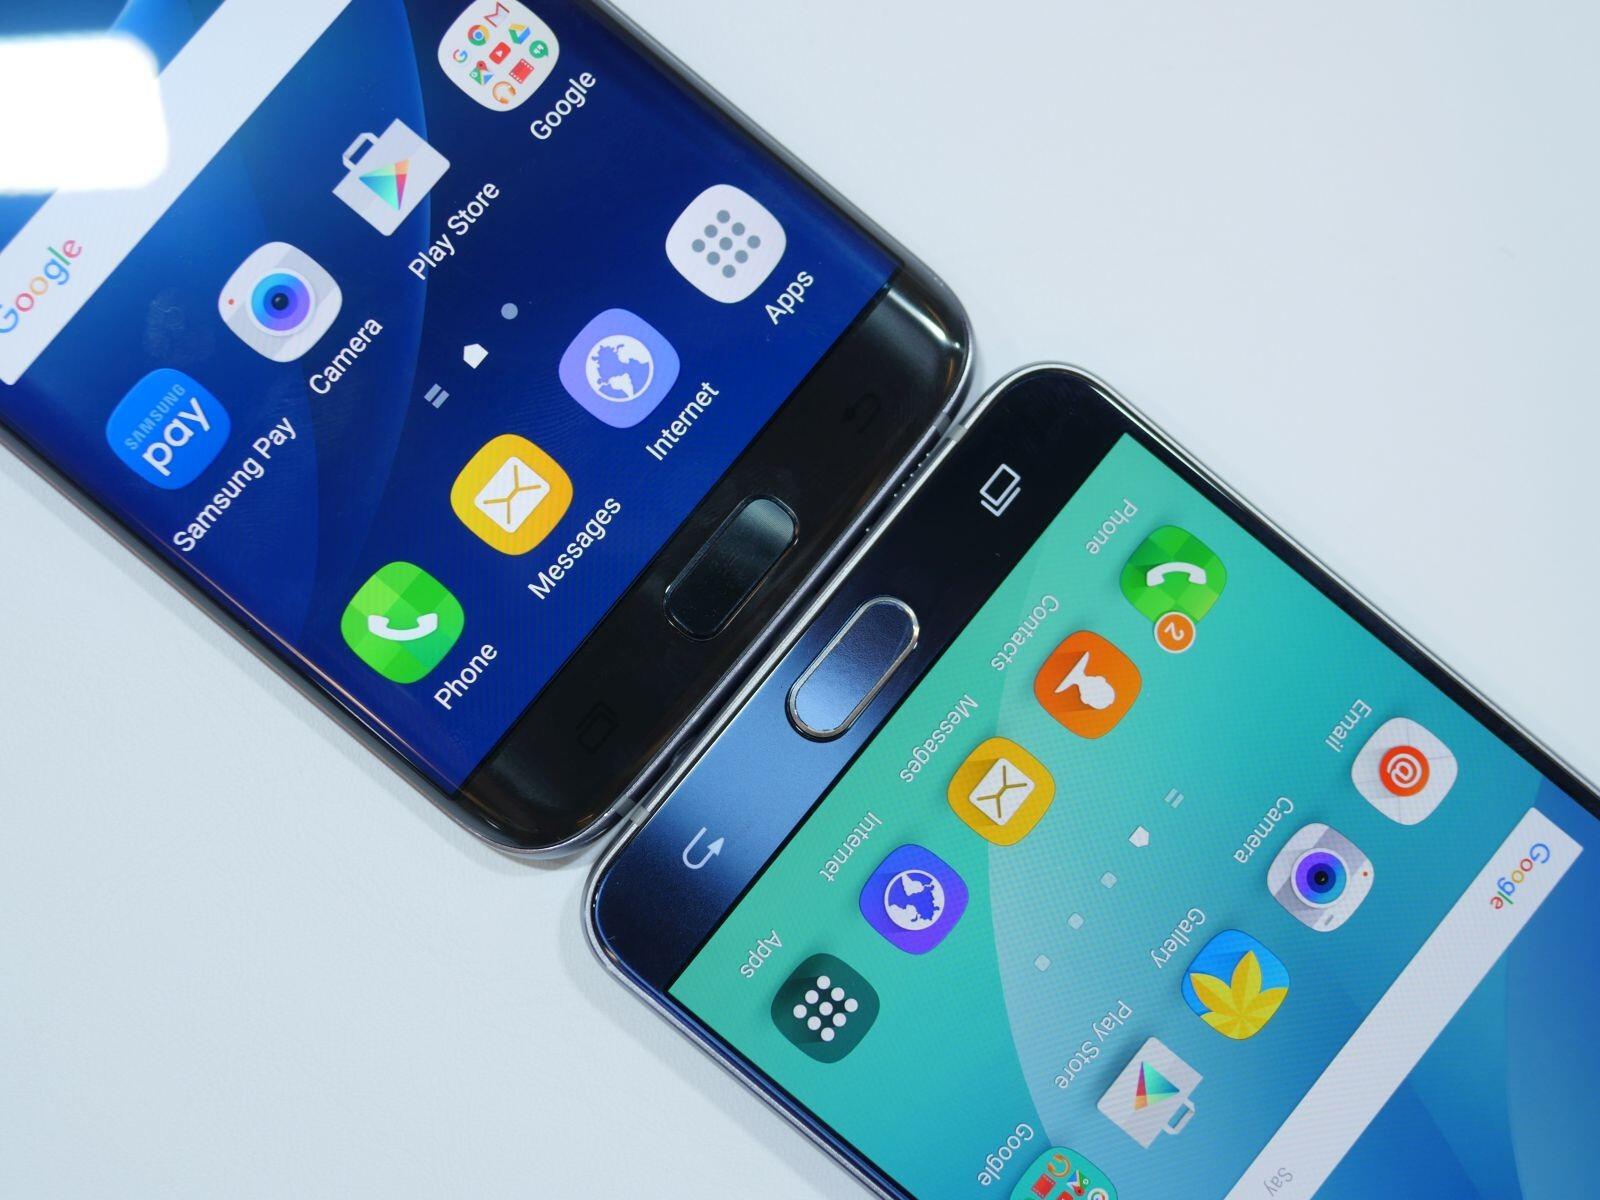 Samsung Galaxy S7 Edge Vs Samsung Galaxy Note 5: First